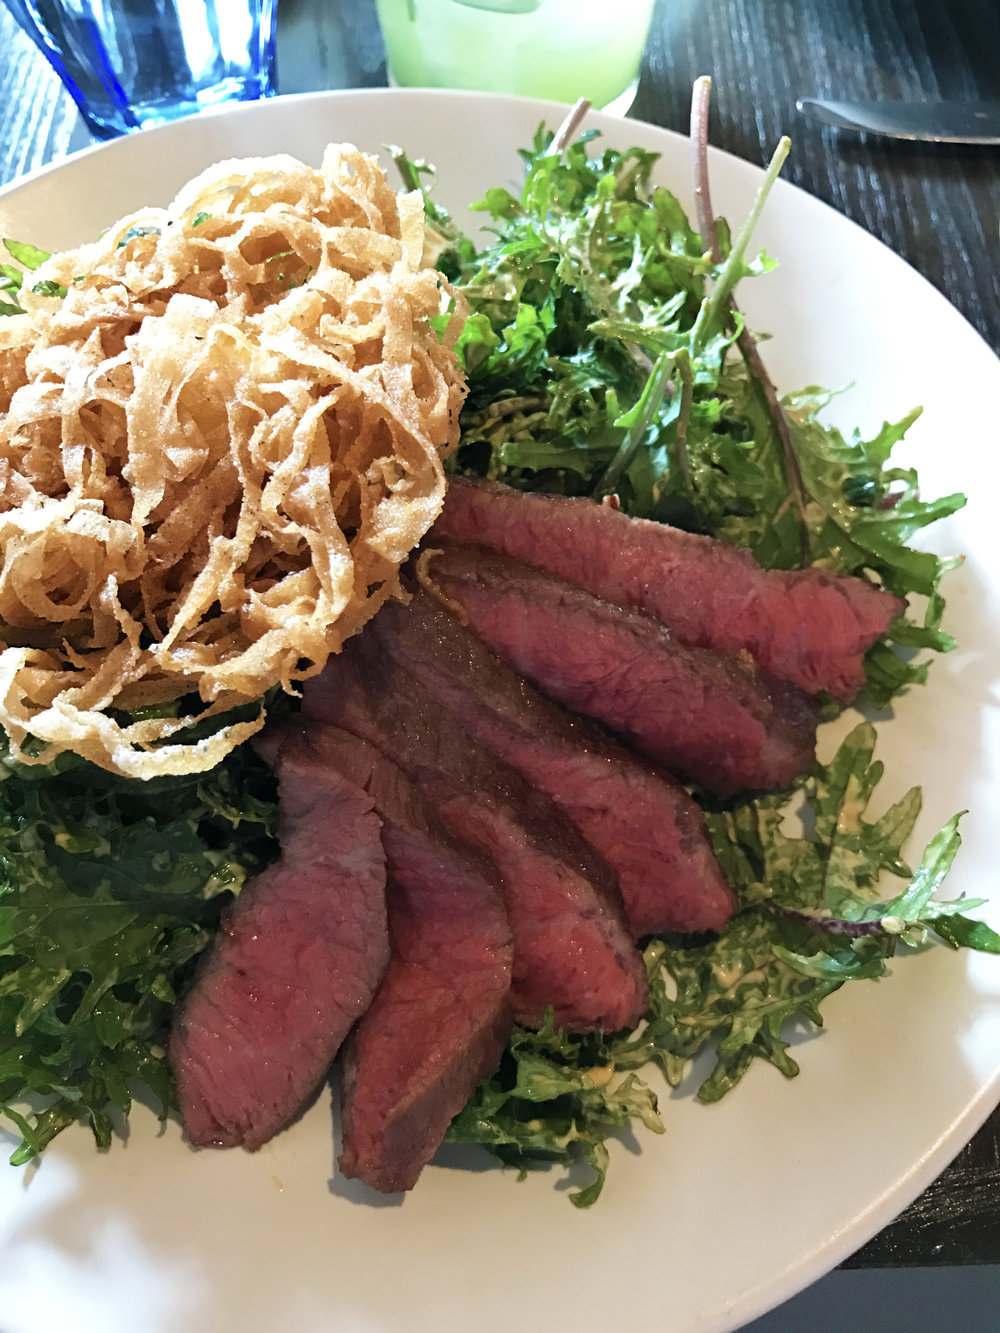 Steak and Eggs - flatiron, kale, chipotle vinaigrette, crispy egg